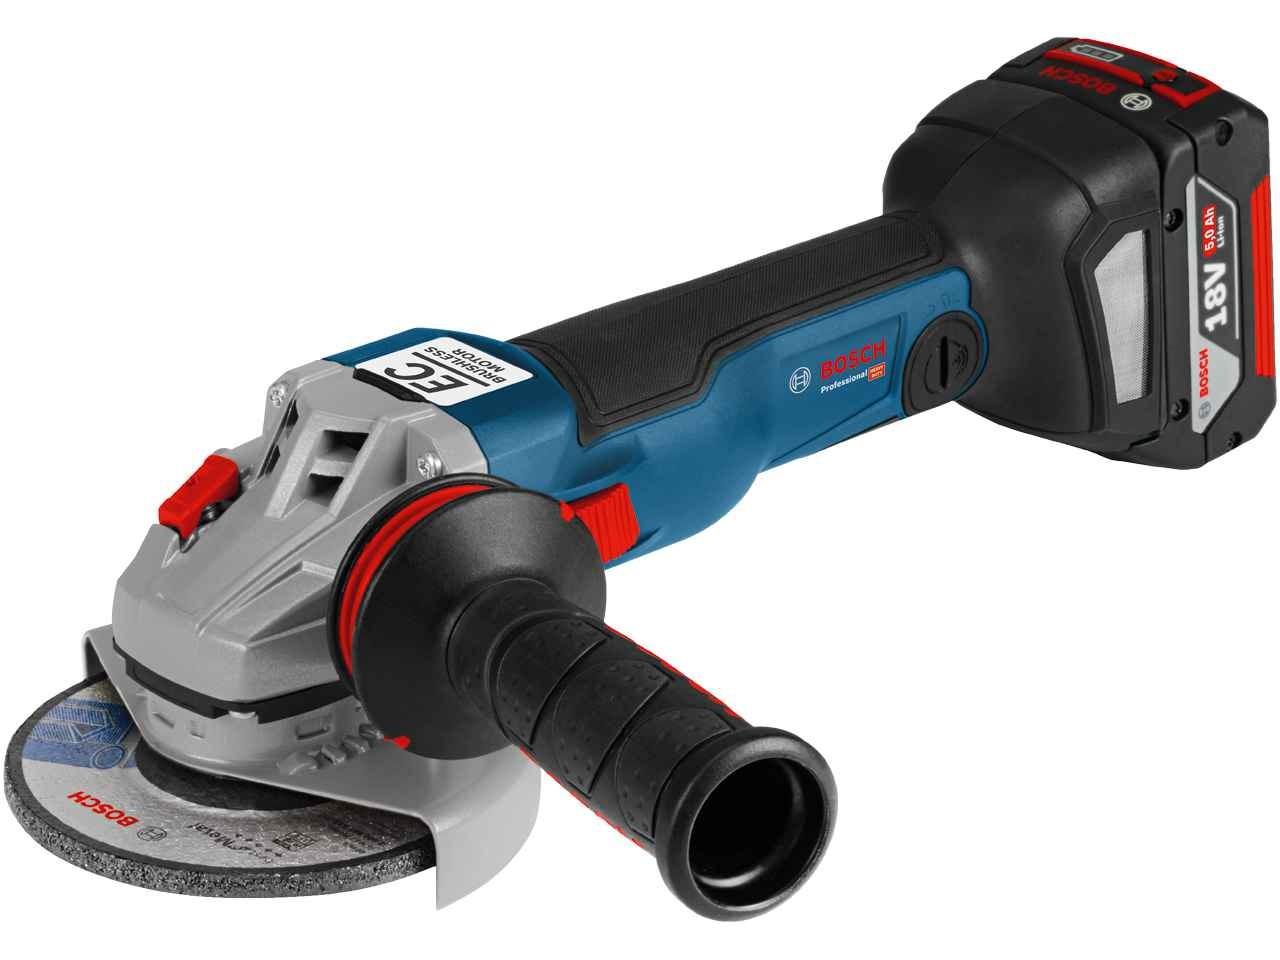 cordless grinder. bosch gws18v125scncg 18v 125mm bluetooth professional cordless angle grinder - bare unit x